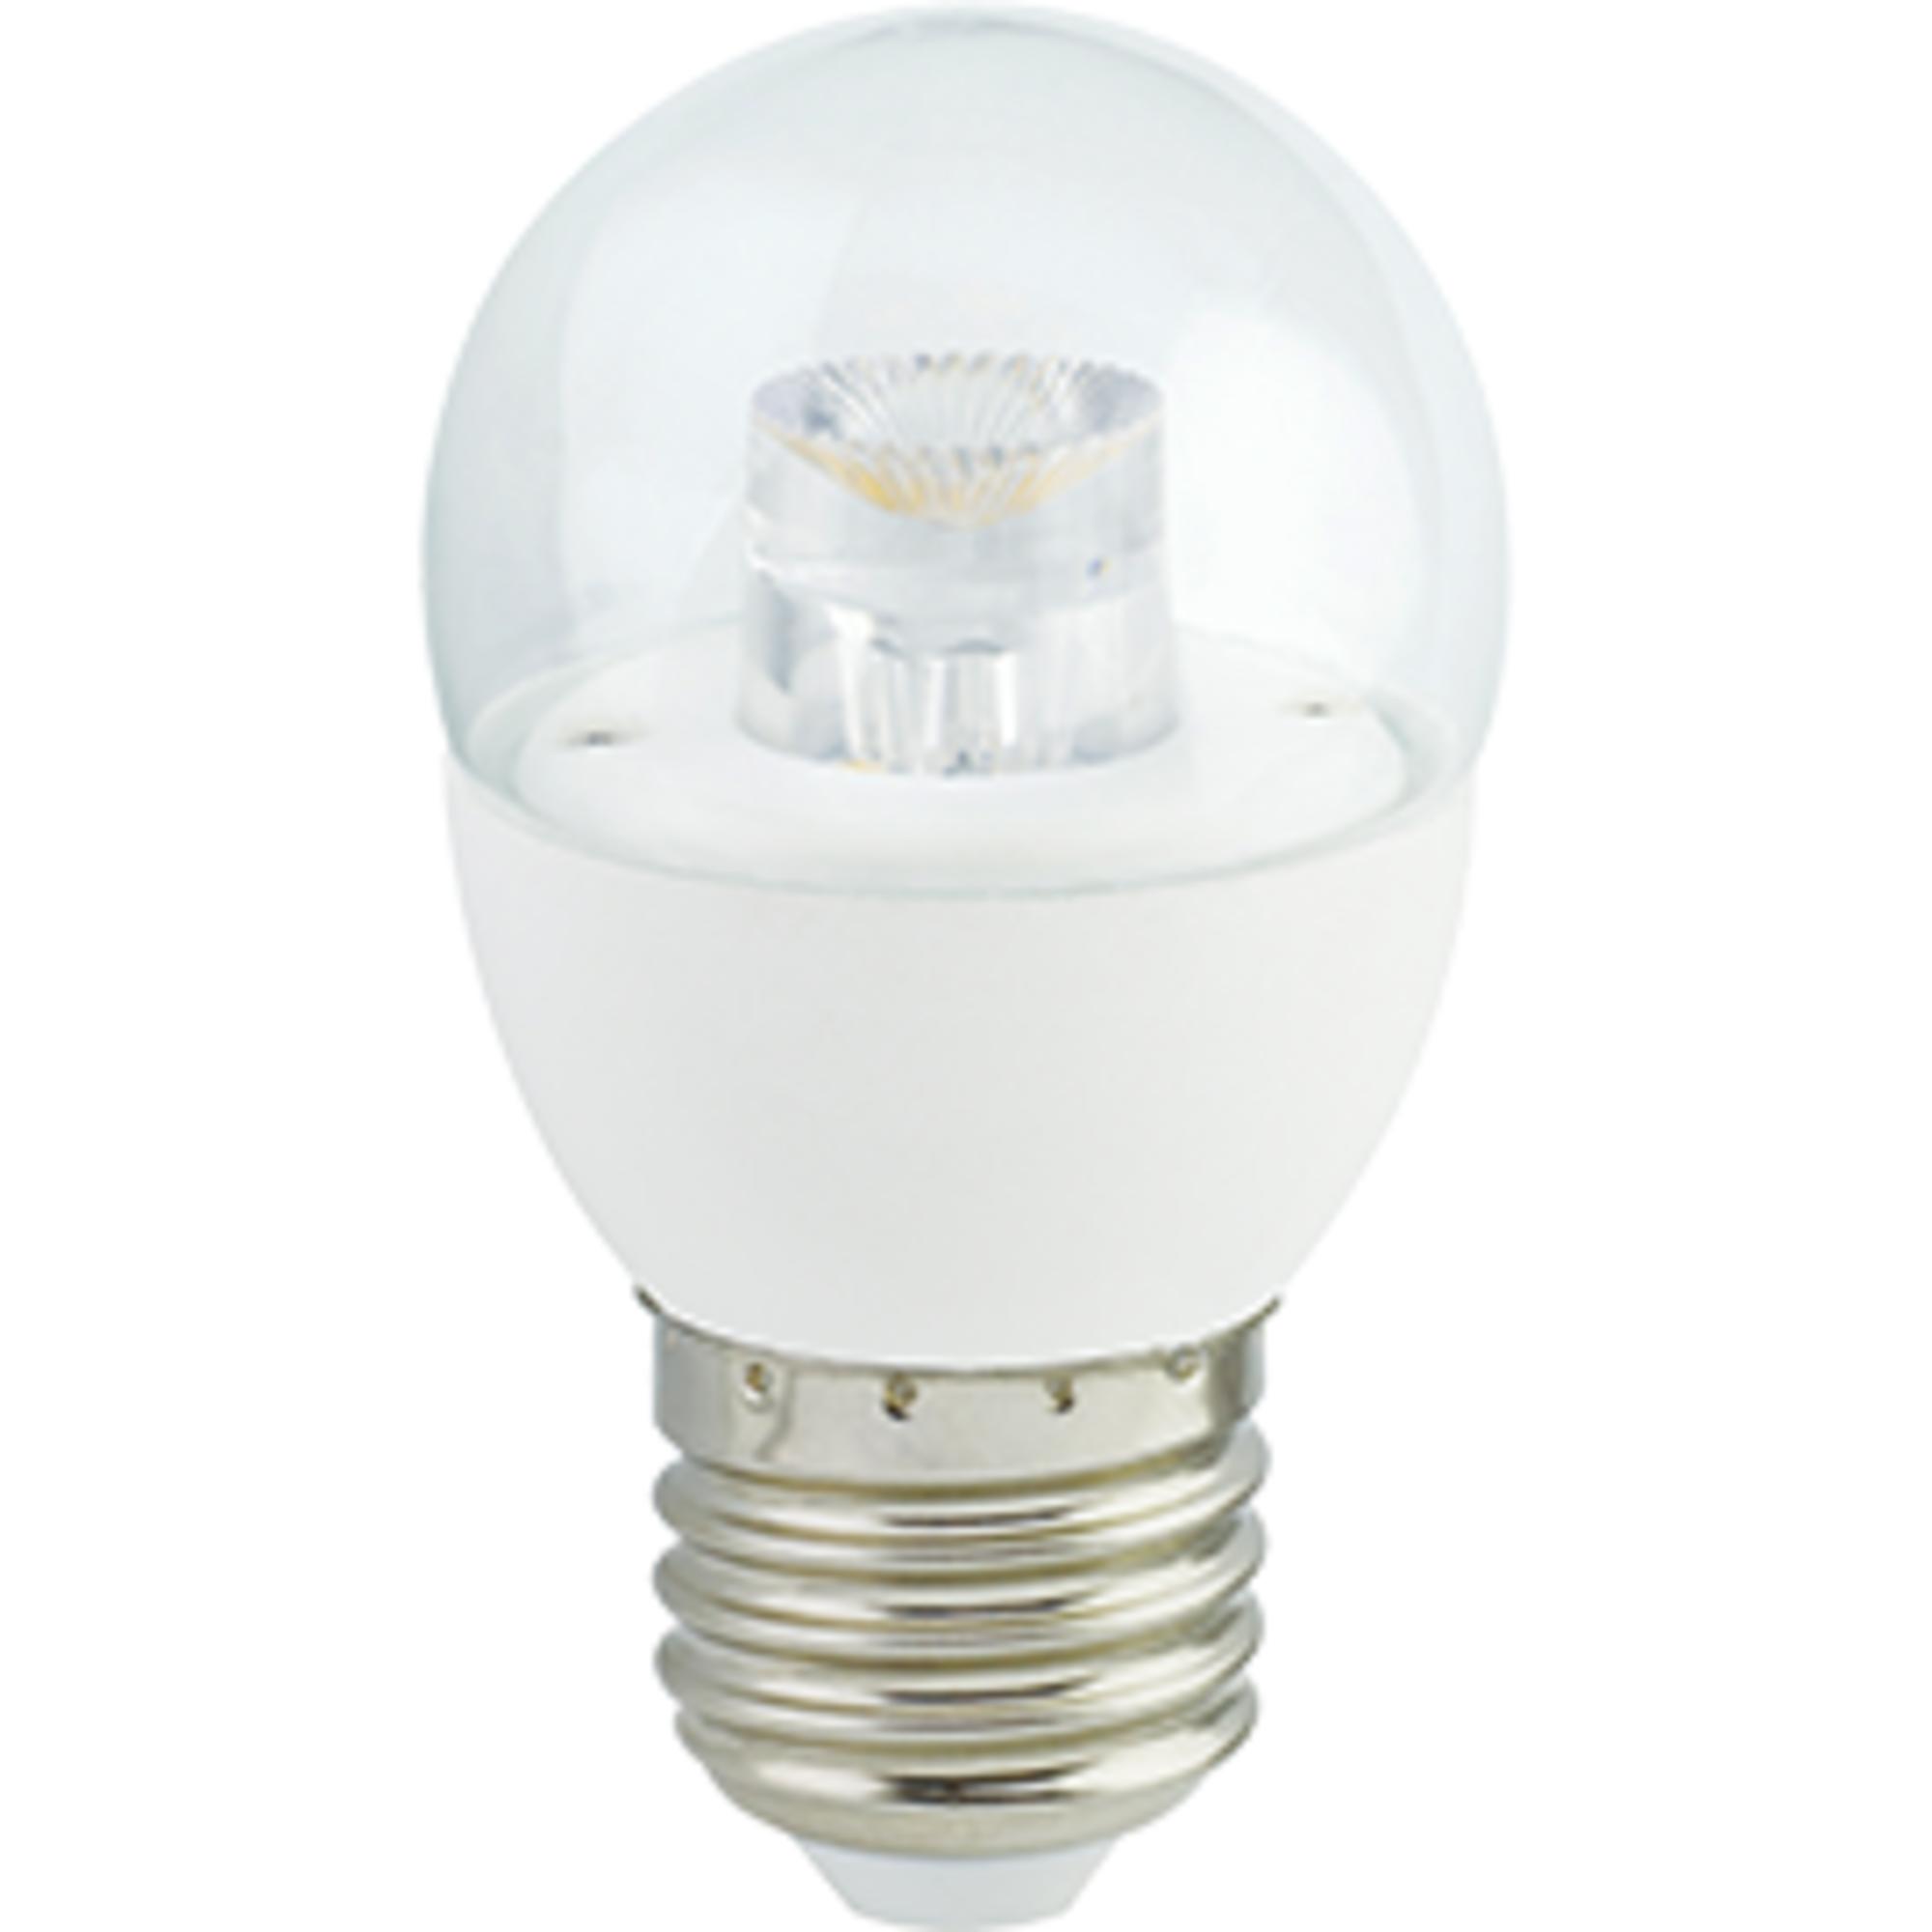 Лампа Ecola Premium светодионая E27 7 Вт шар 560 Лм теплый свет